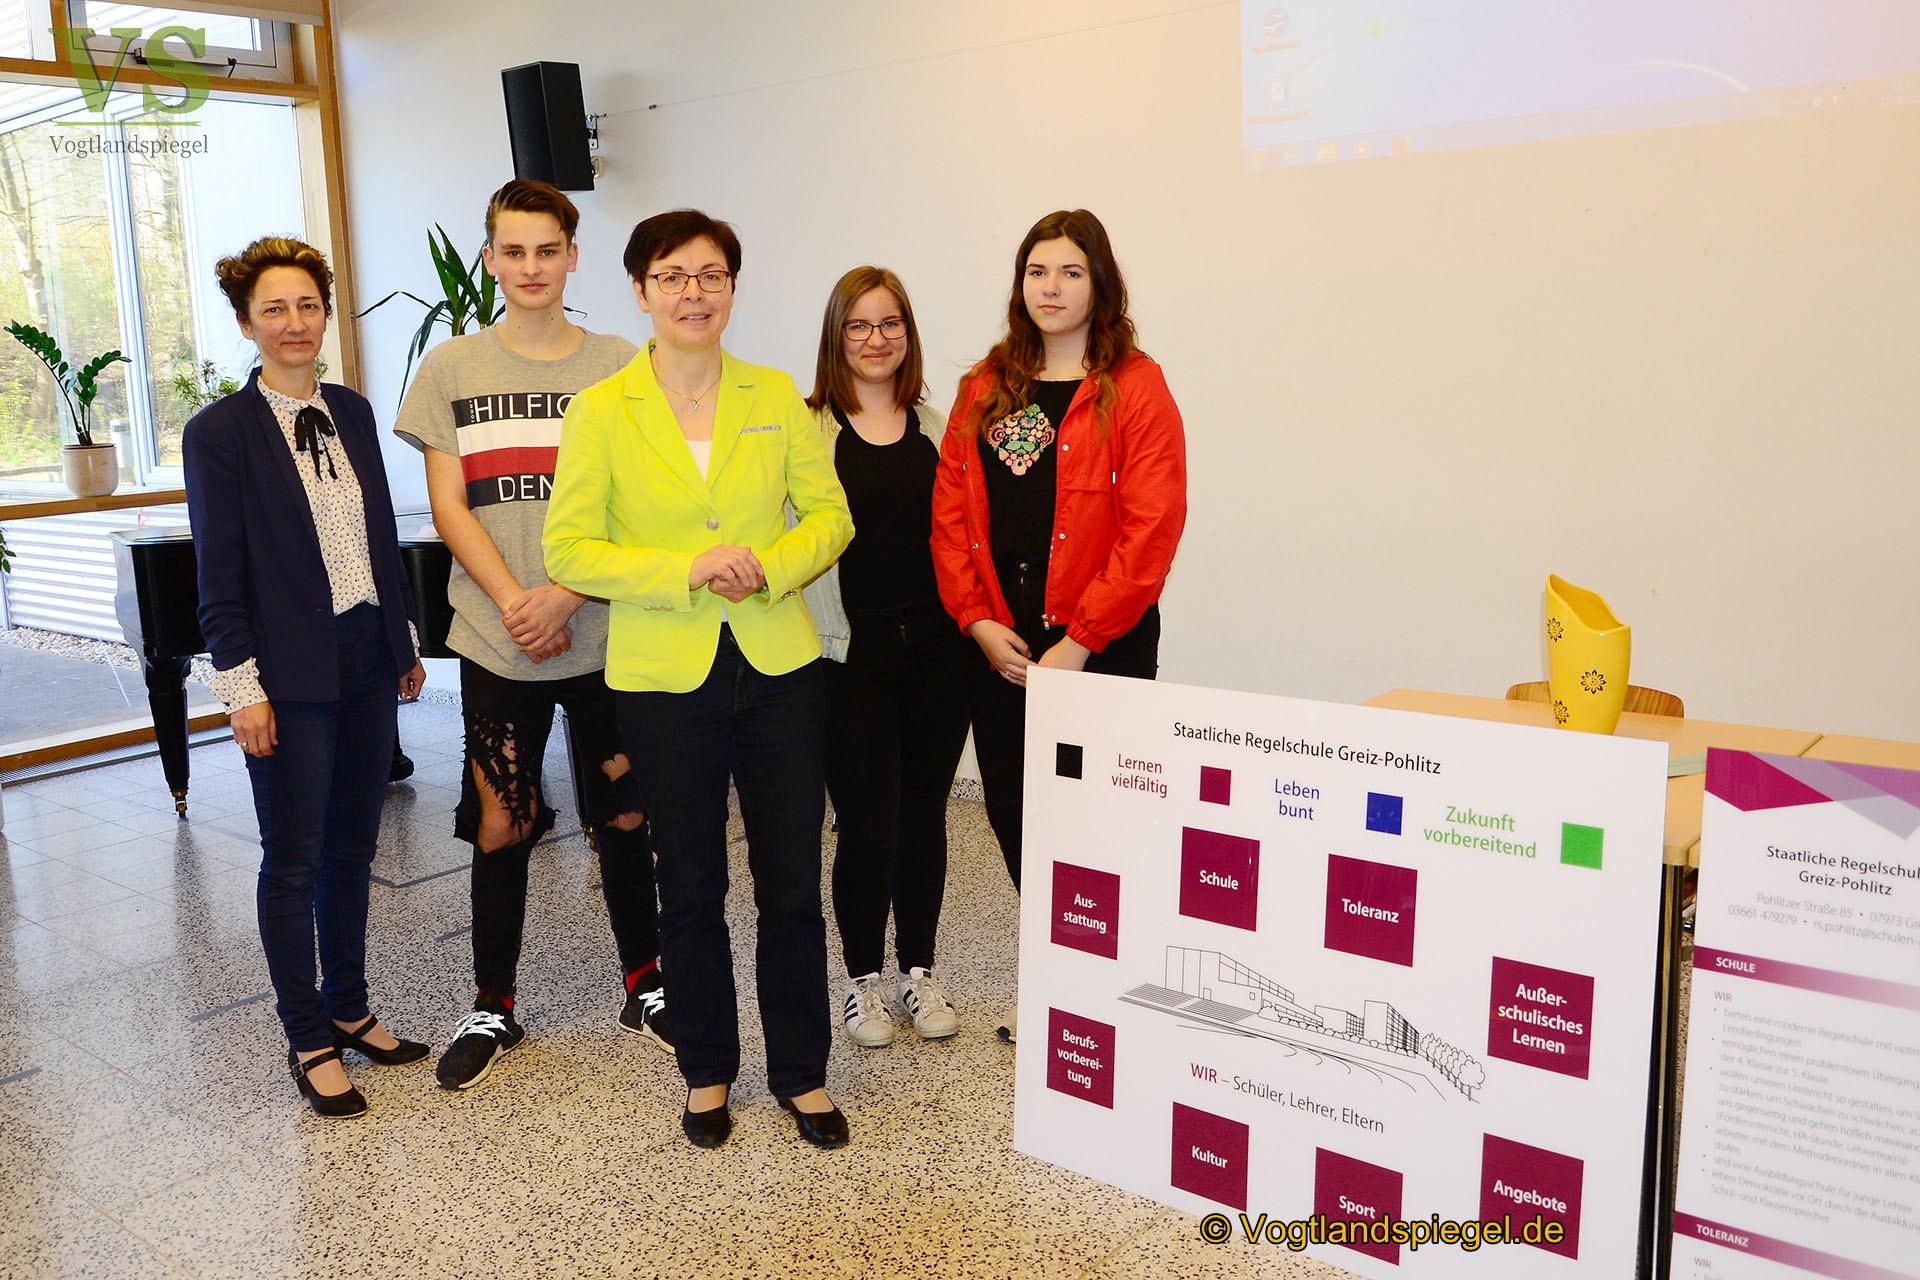 Regelschule Greiz-Pohlitz: Übergabe des Leitbildes